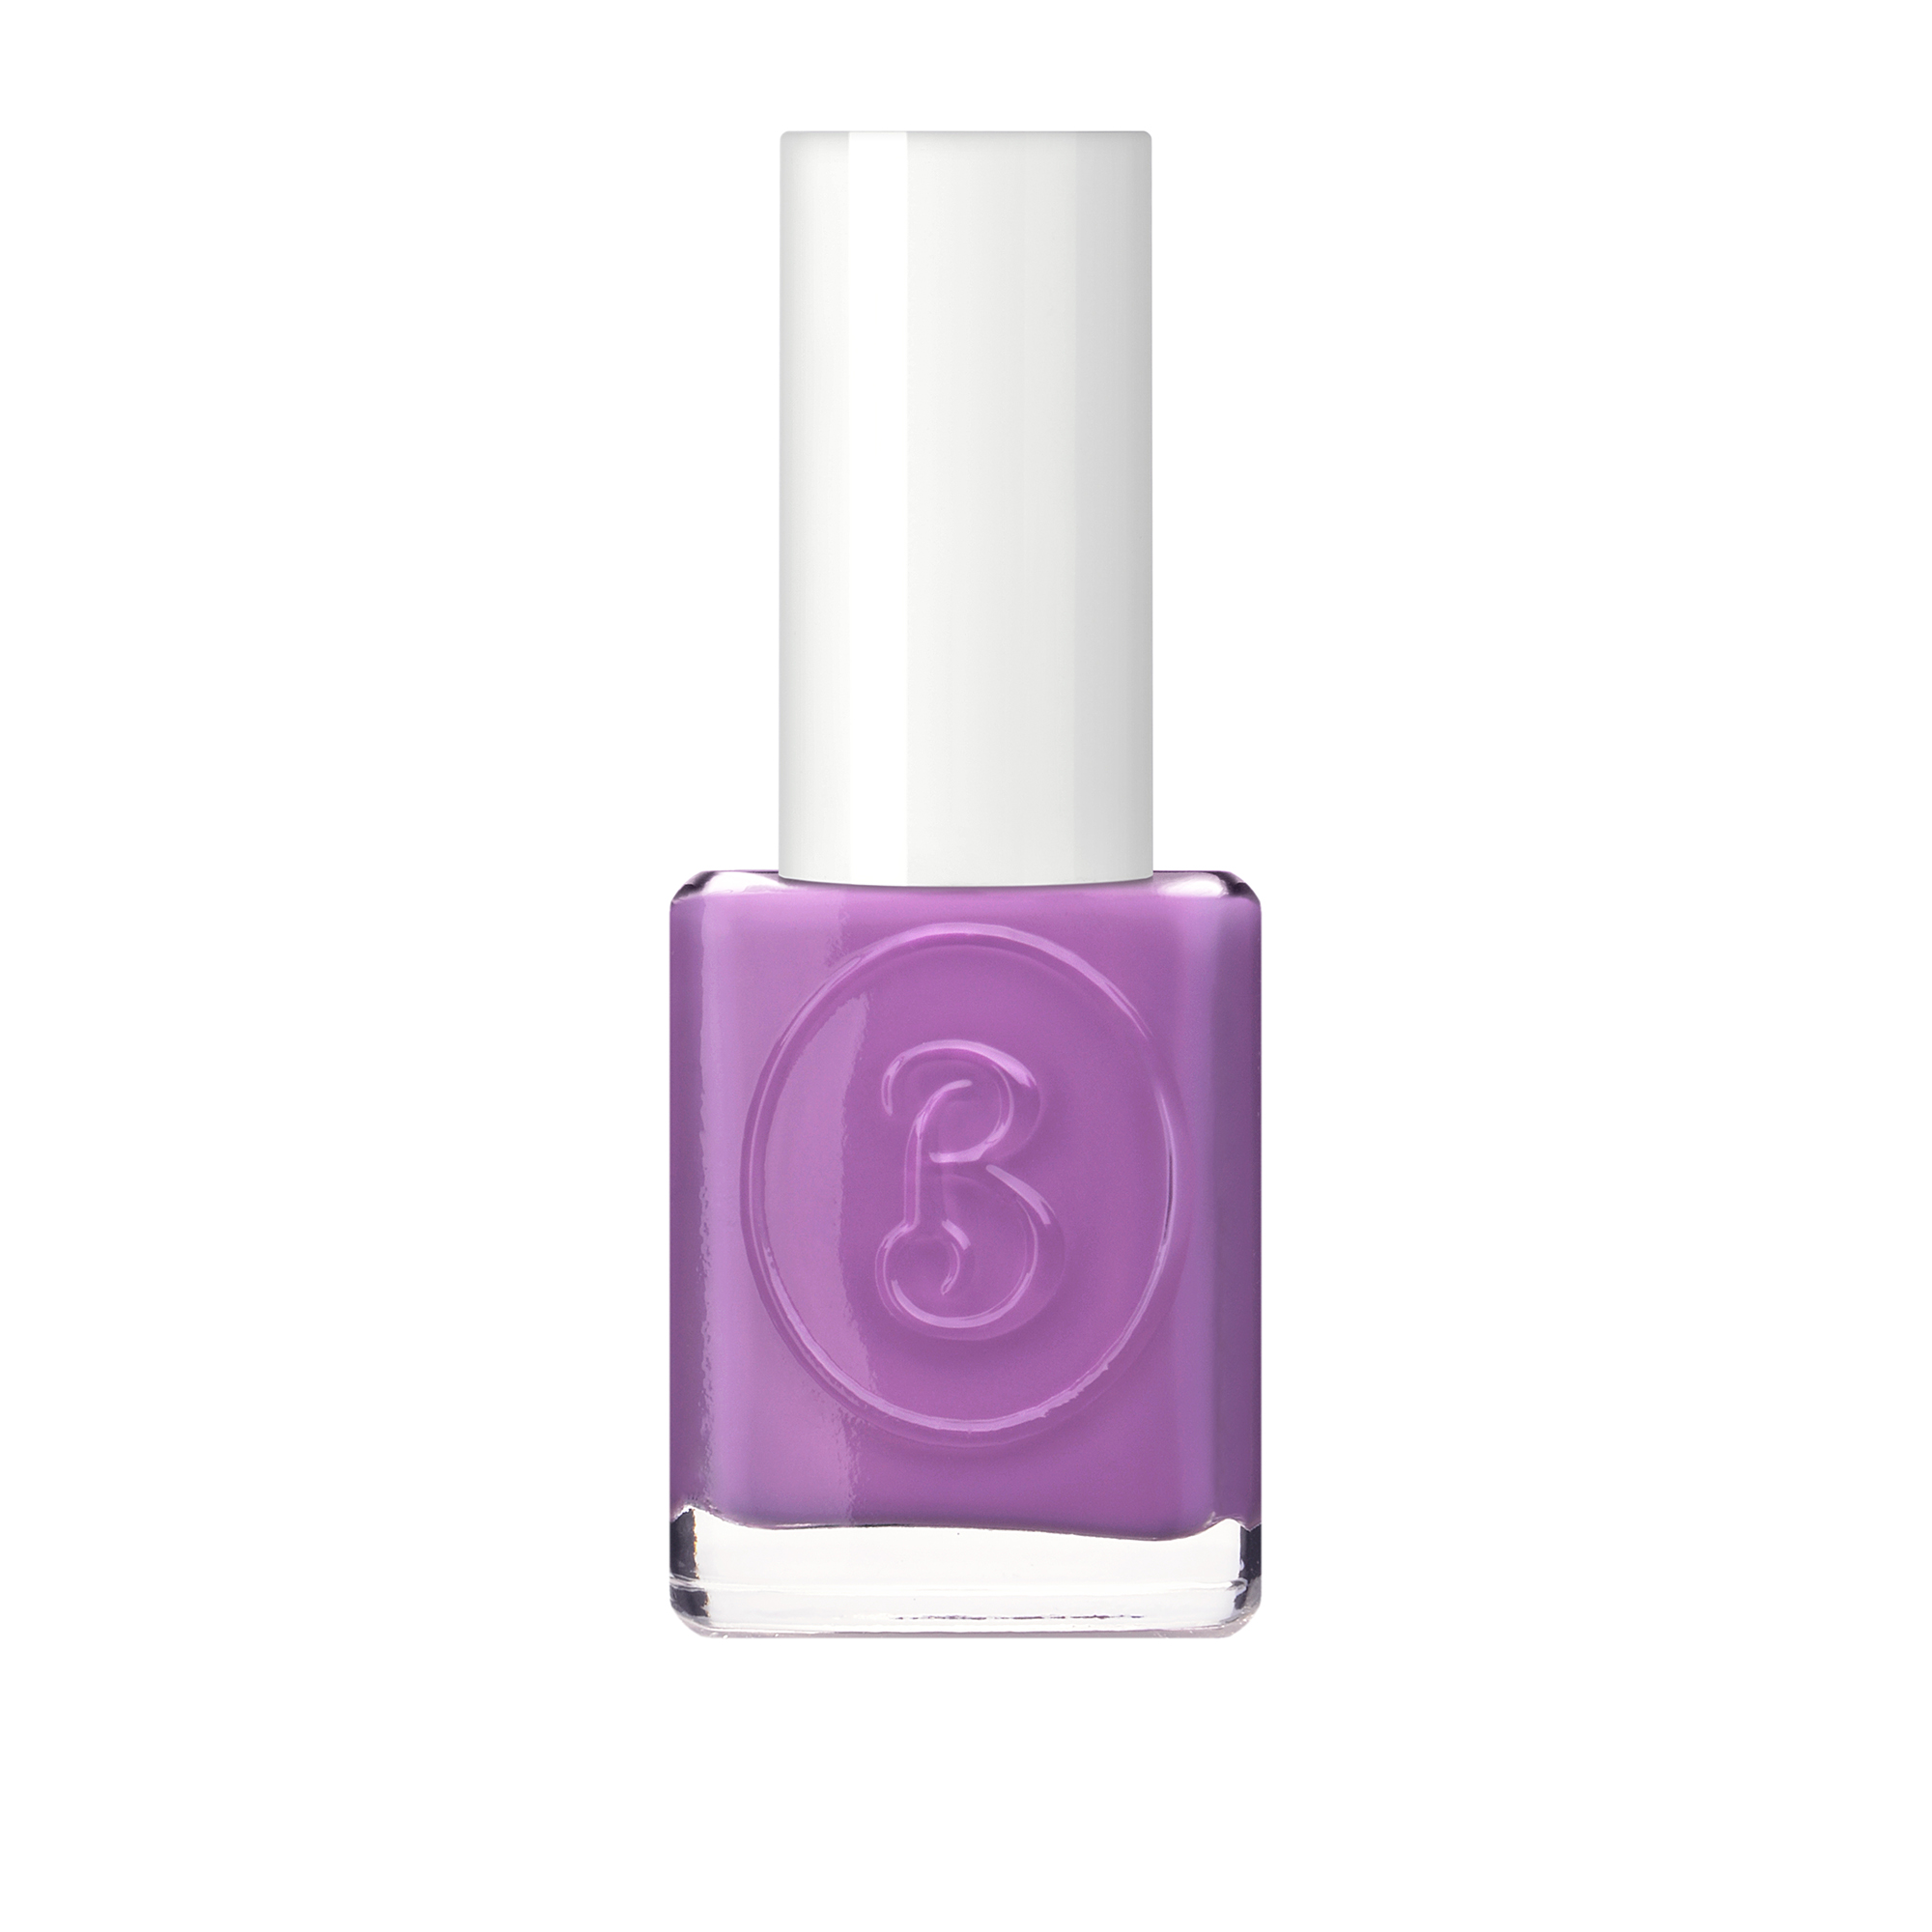 BERENICE 18 лак для ногтей, светло фиолетовый / Light violet 16 мл лаки для ногтей berenice лак для ногтей 18 тон 16 мл